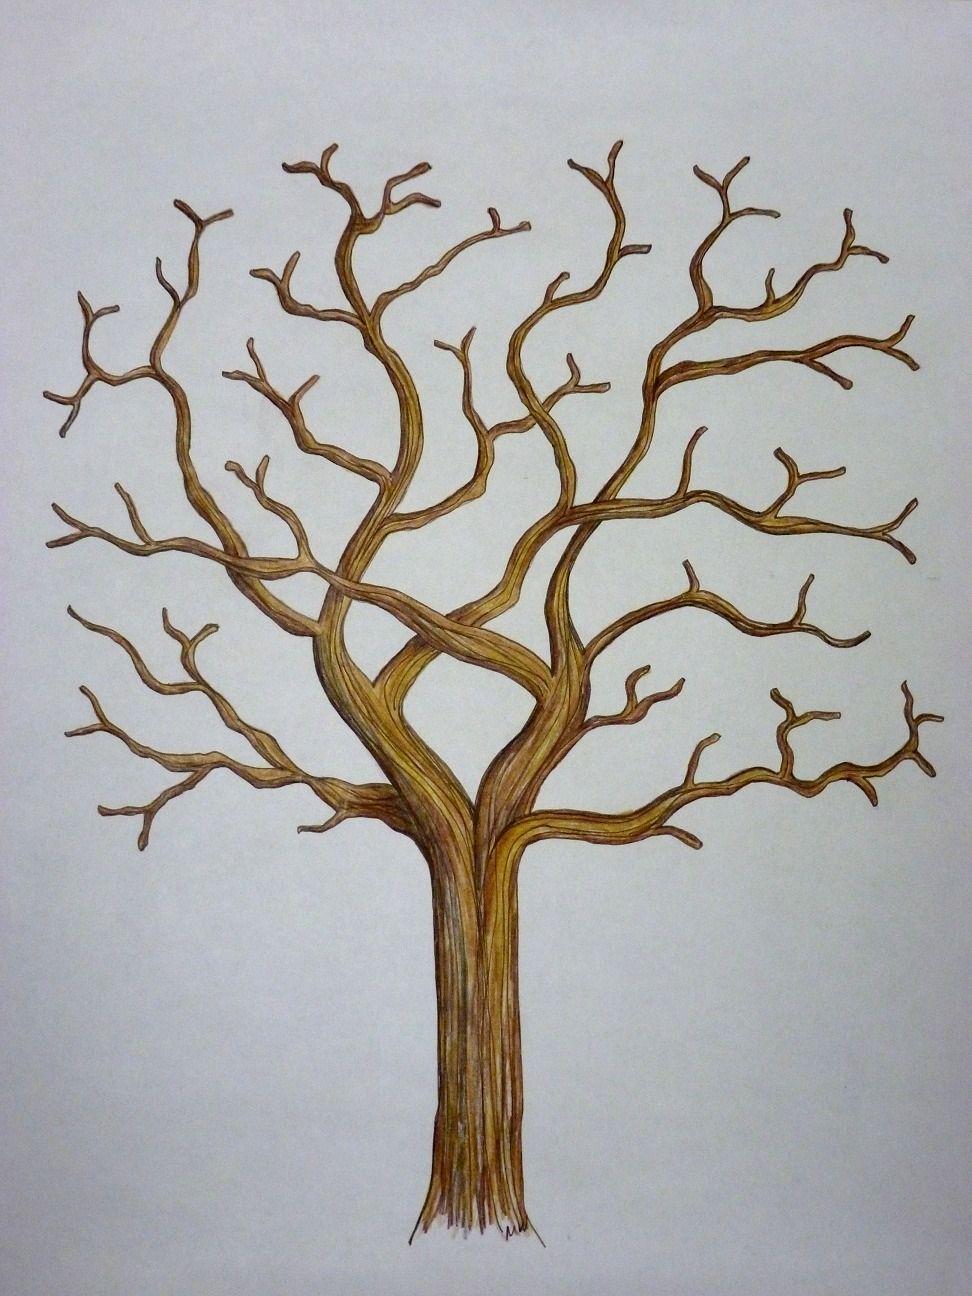 The diy wedding tree free downloadable template wall art ideas